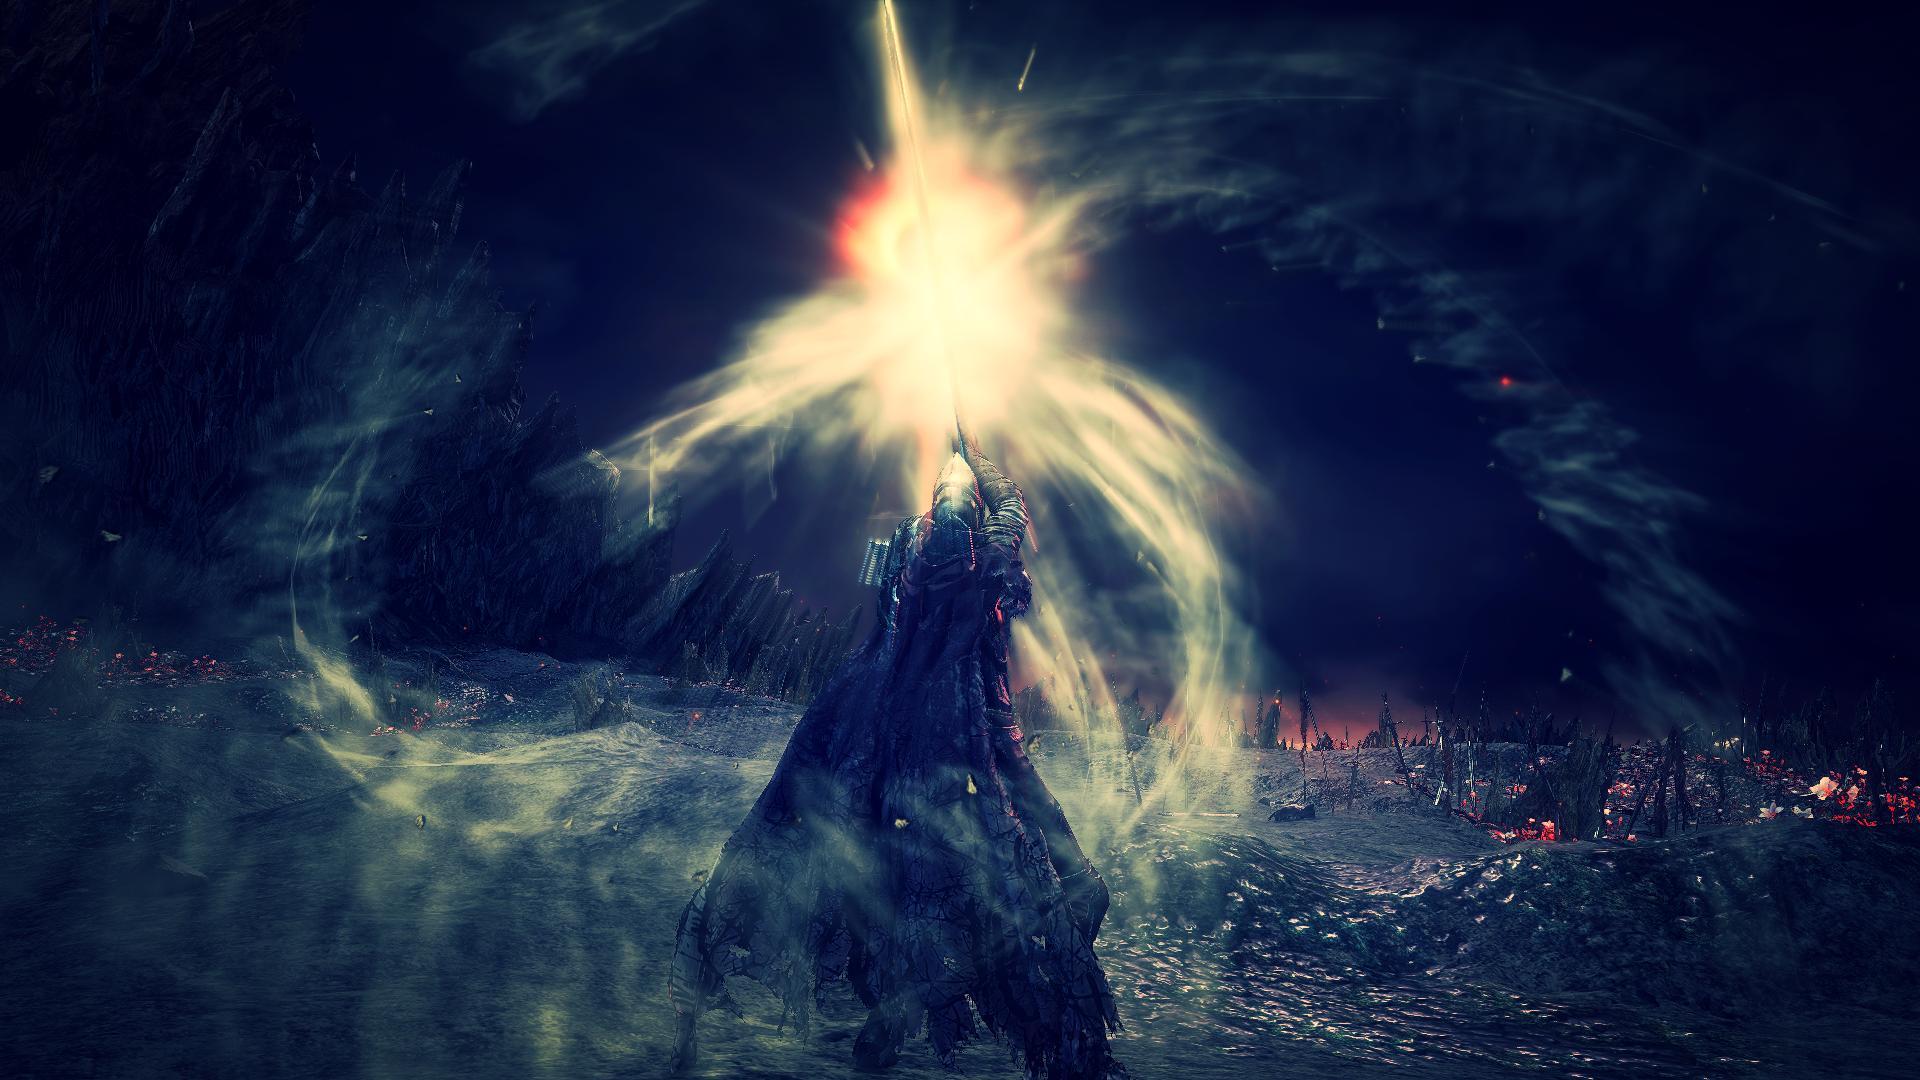 Interactive Wallpaper Iphone X Dark Souls 3 Wallpapers Pictures Images